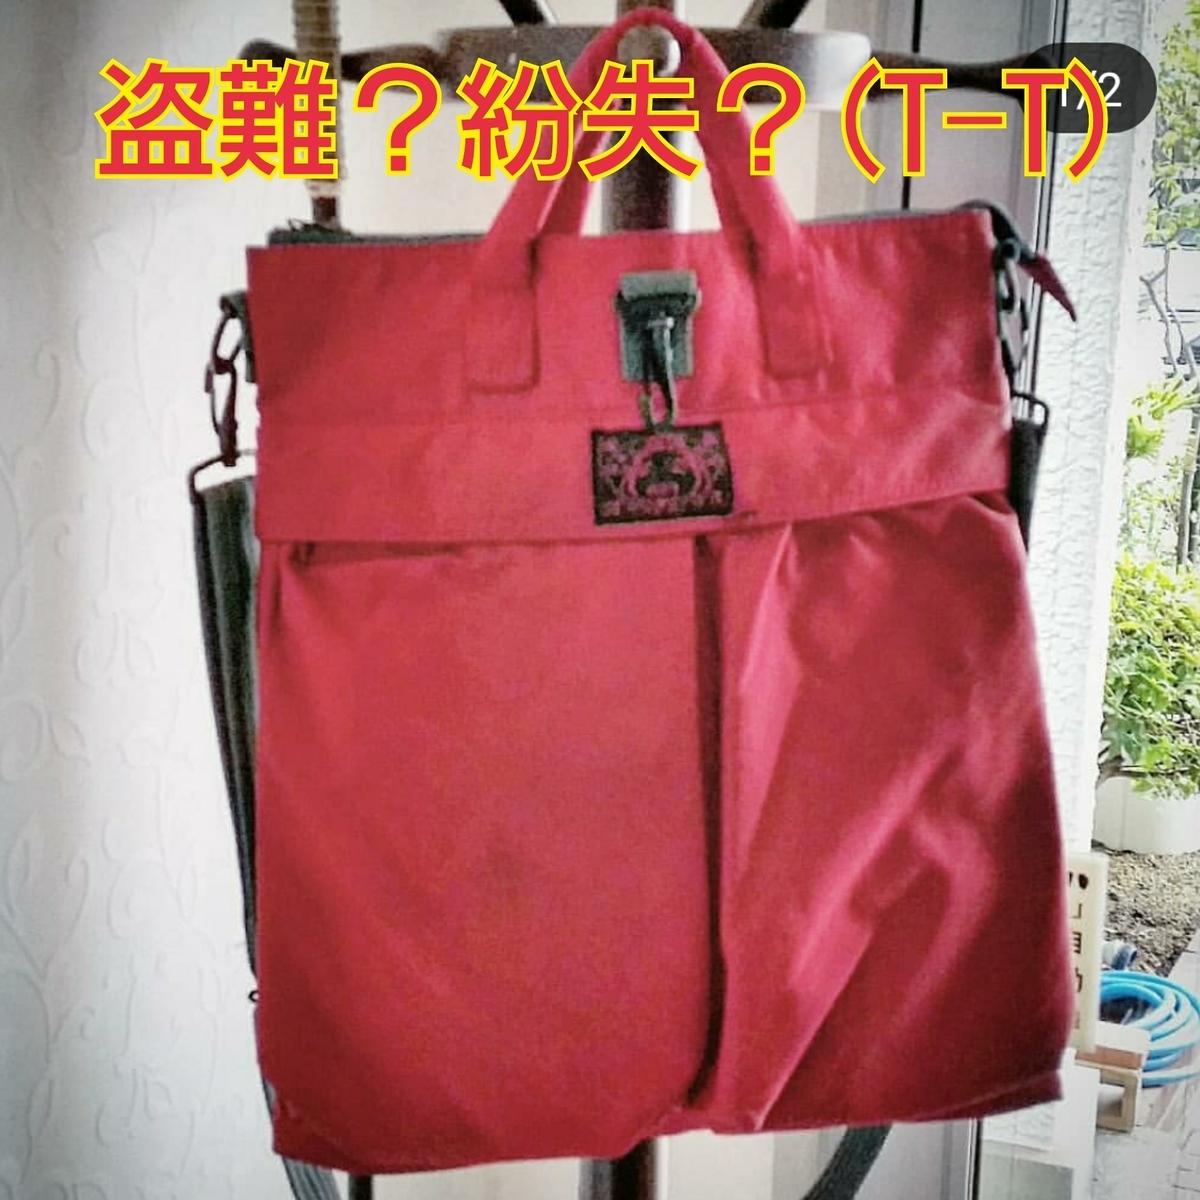 f:id:ichigo-ichie411211:20190830141841j:plain